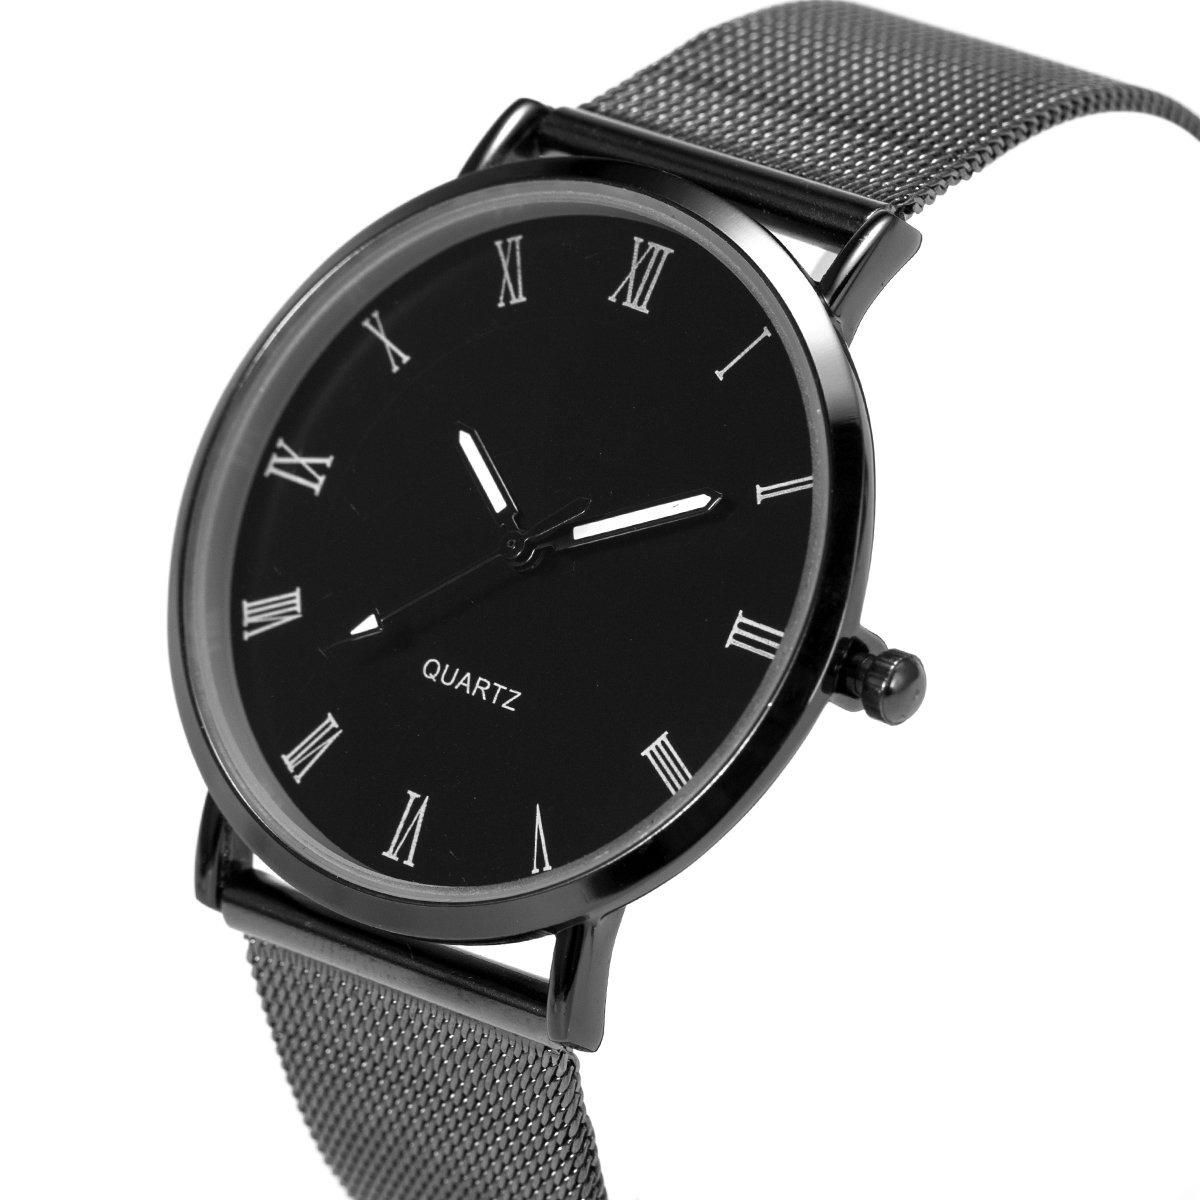 2a750686a9a1 reloj de pulsera para hombre minimalista ultra fino de ma. Cargando zoom.